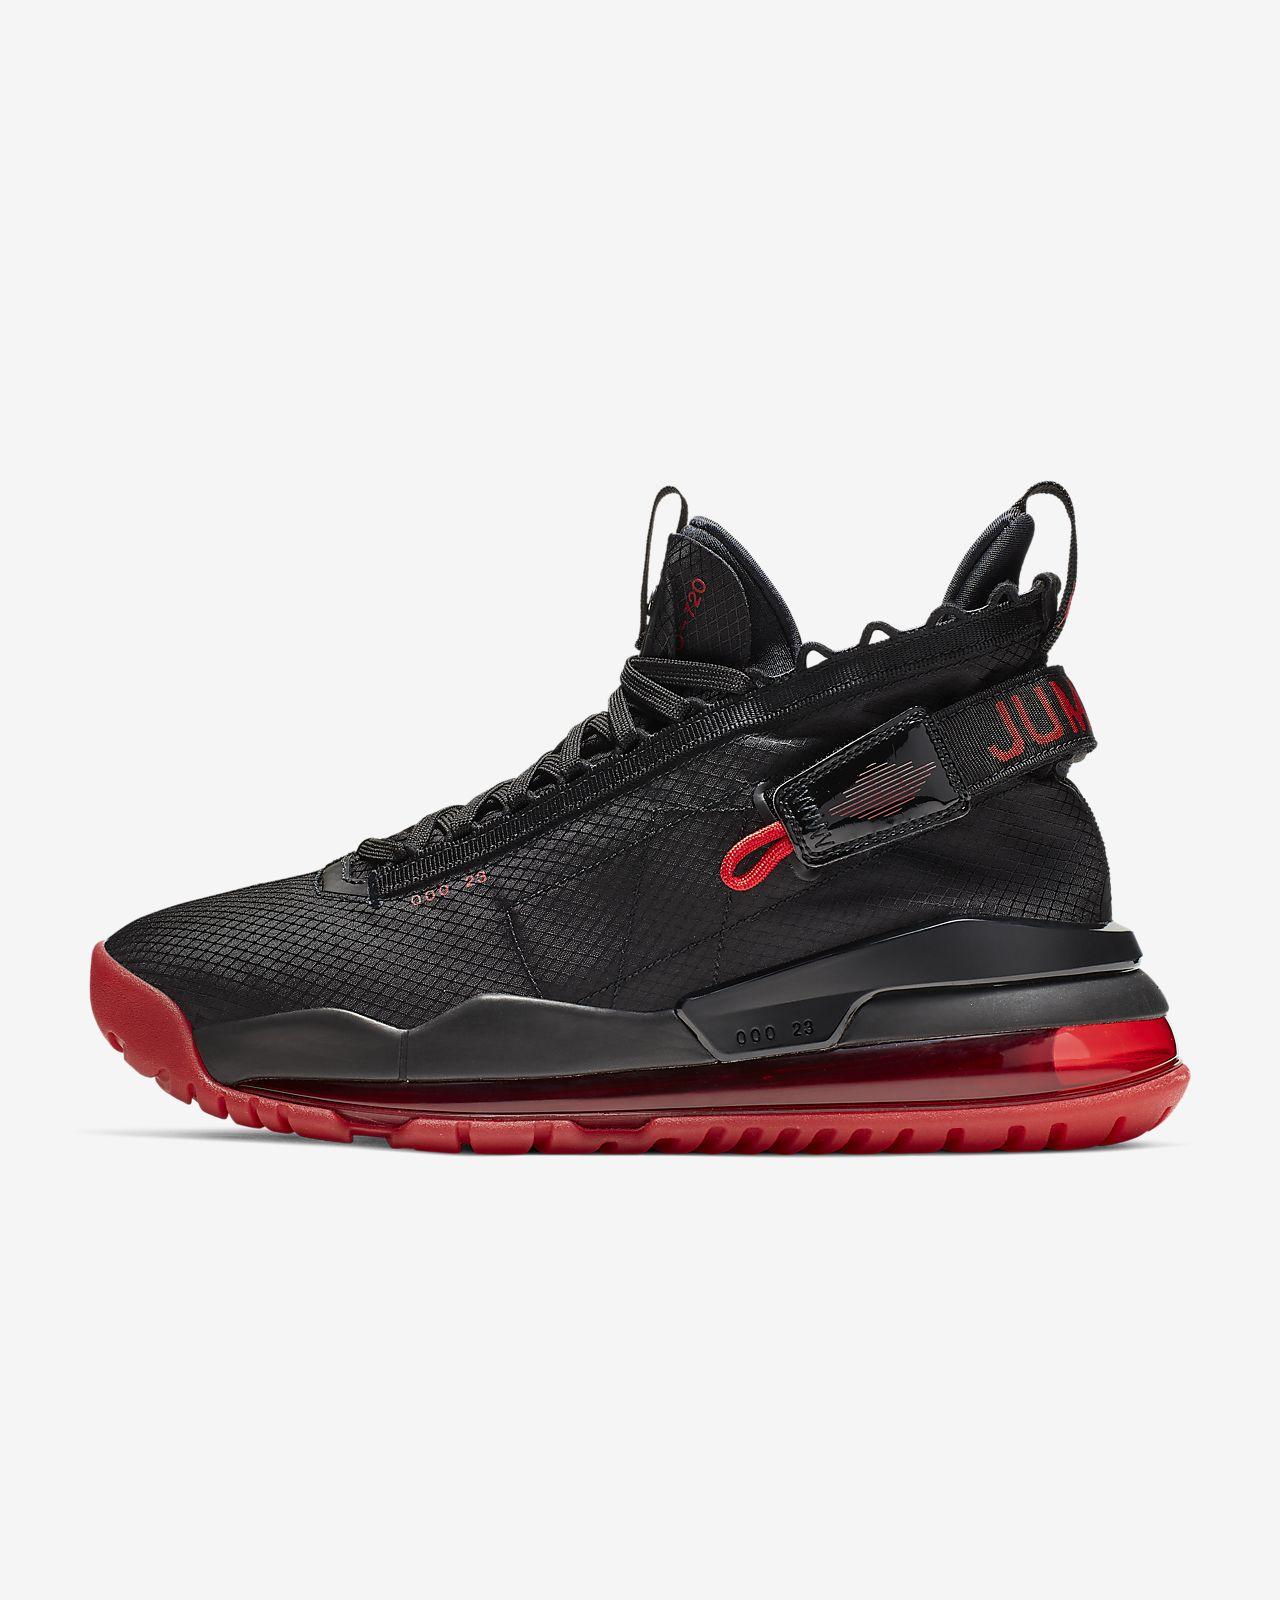 Pour Homme Chaussure Proto Max 720 Jordan rxoeWCdB